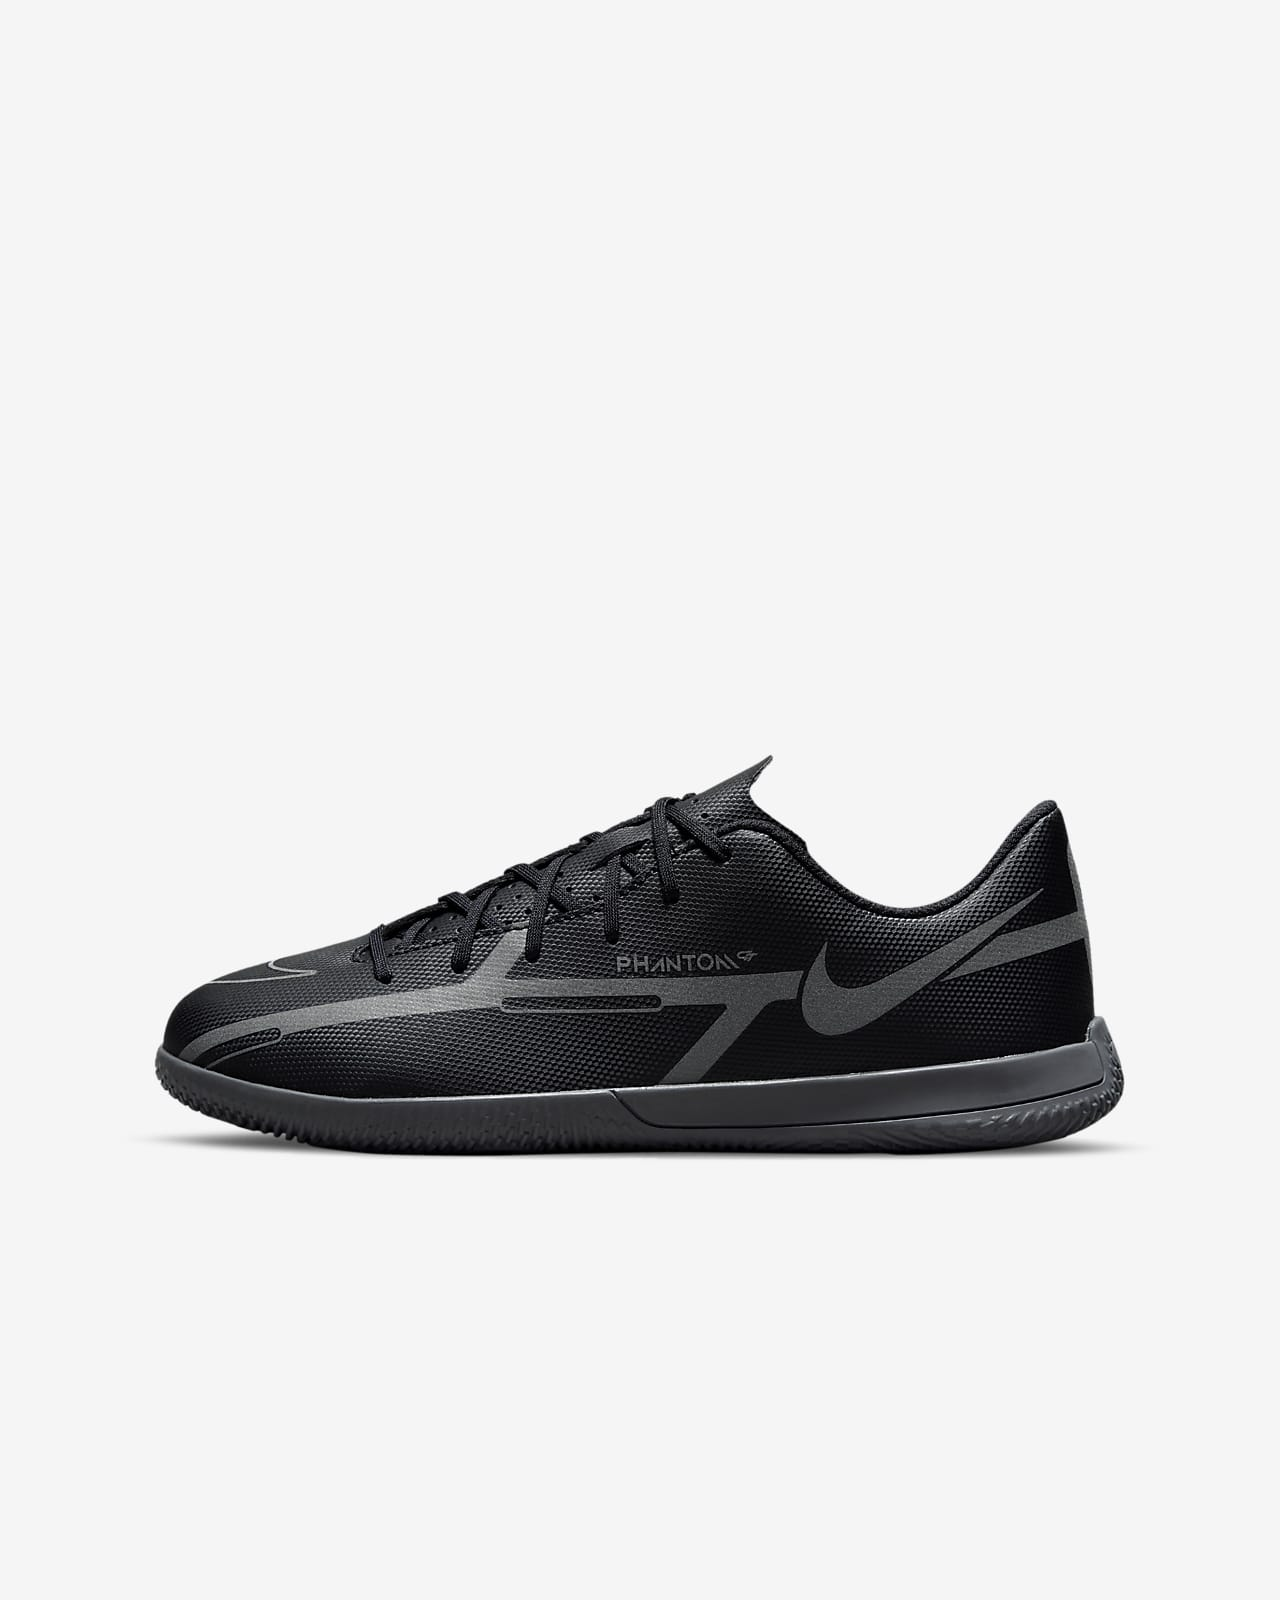 Nike Jr. Phantom GT2 Club IC Older/Younger Kids' Indoor Court Football Shoe